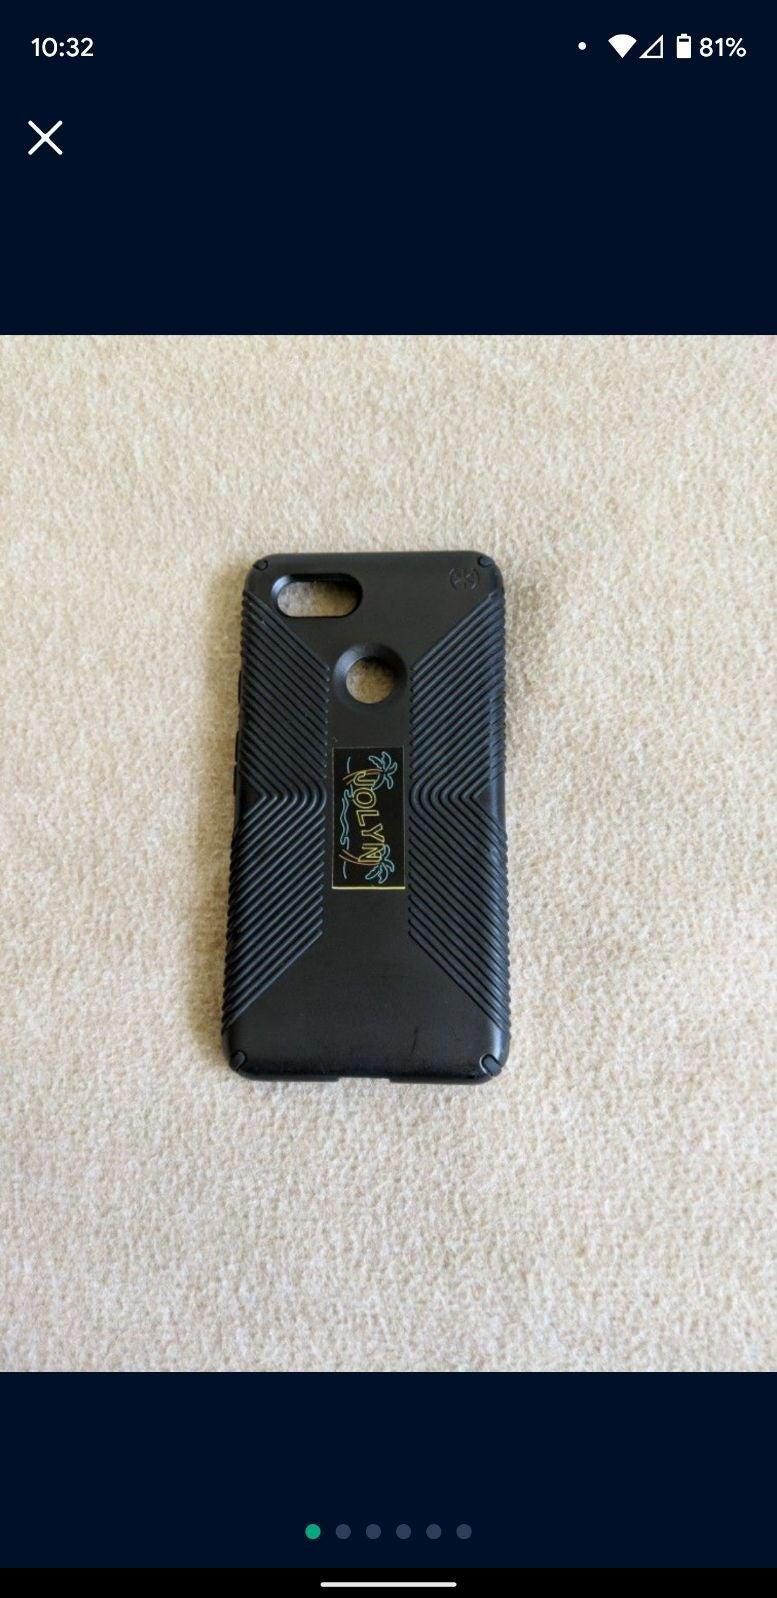 Pixel 3 XL Speck case